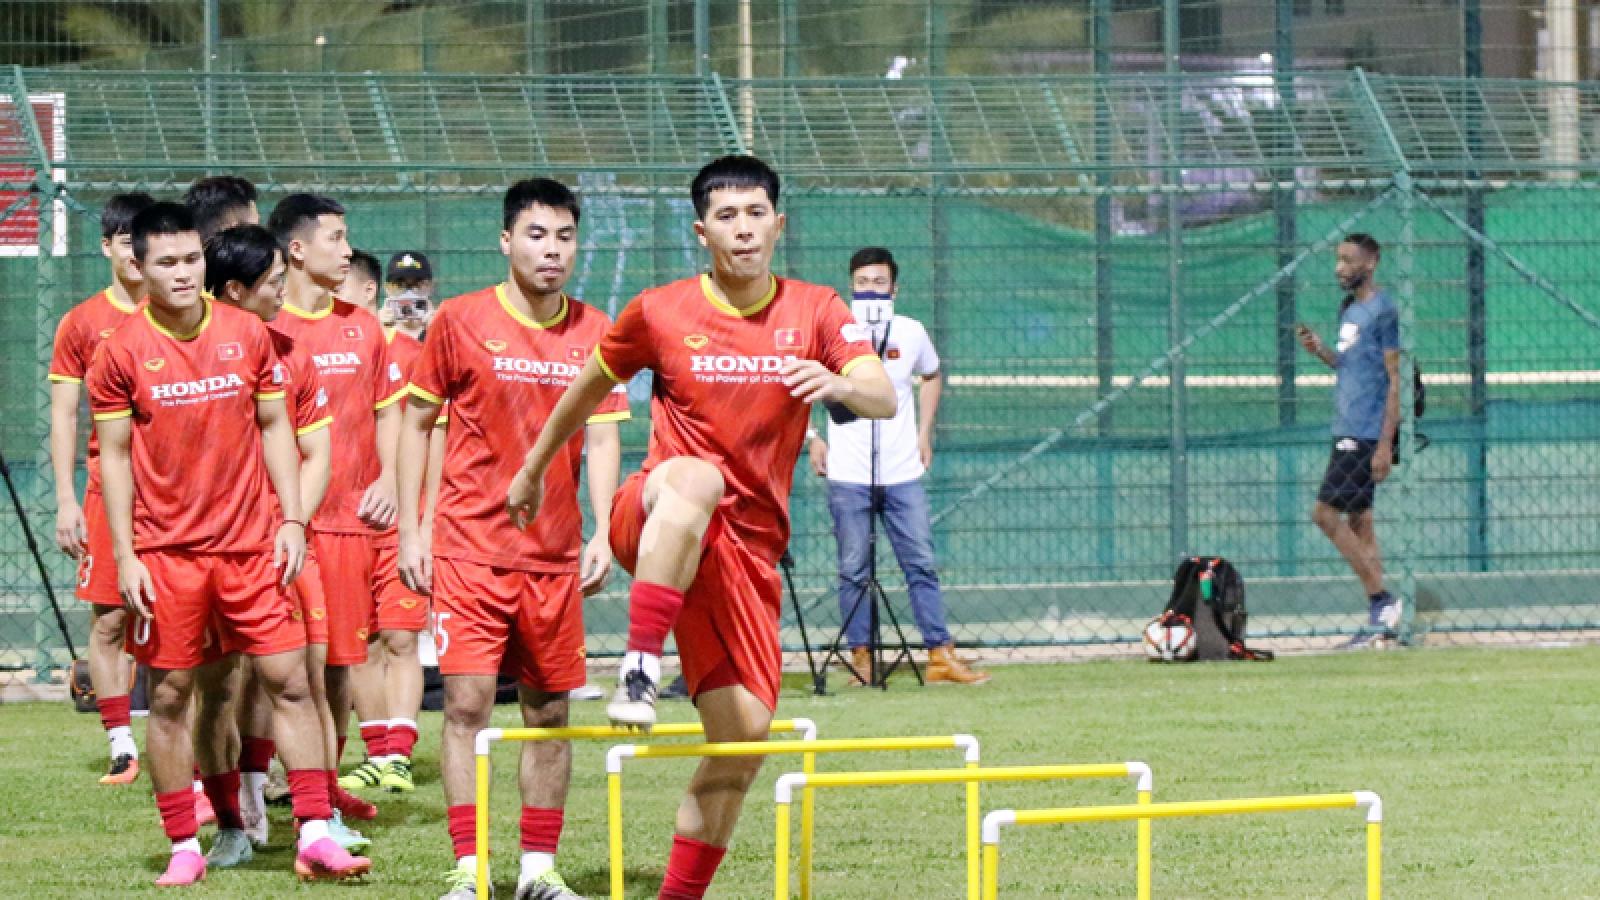 Vietnam national team train hard ahead of clash against Oman